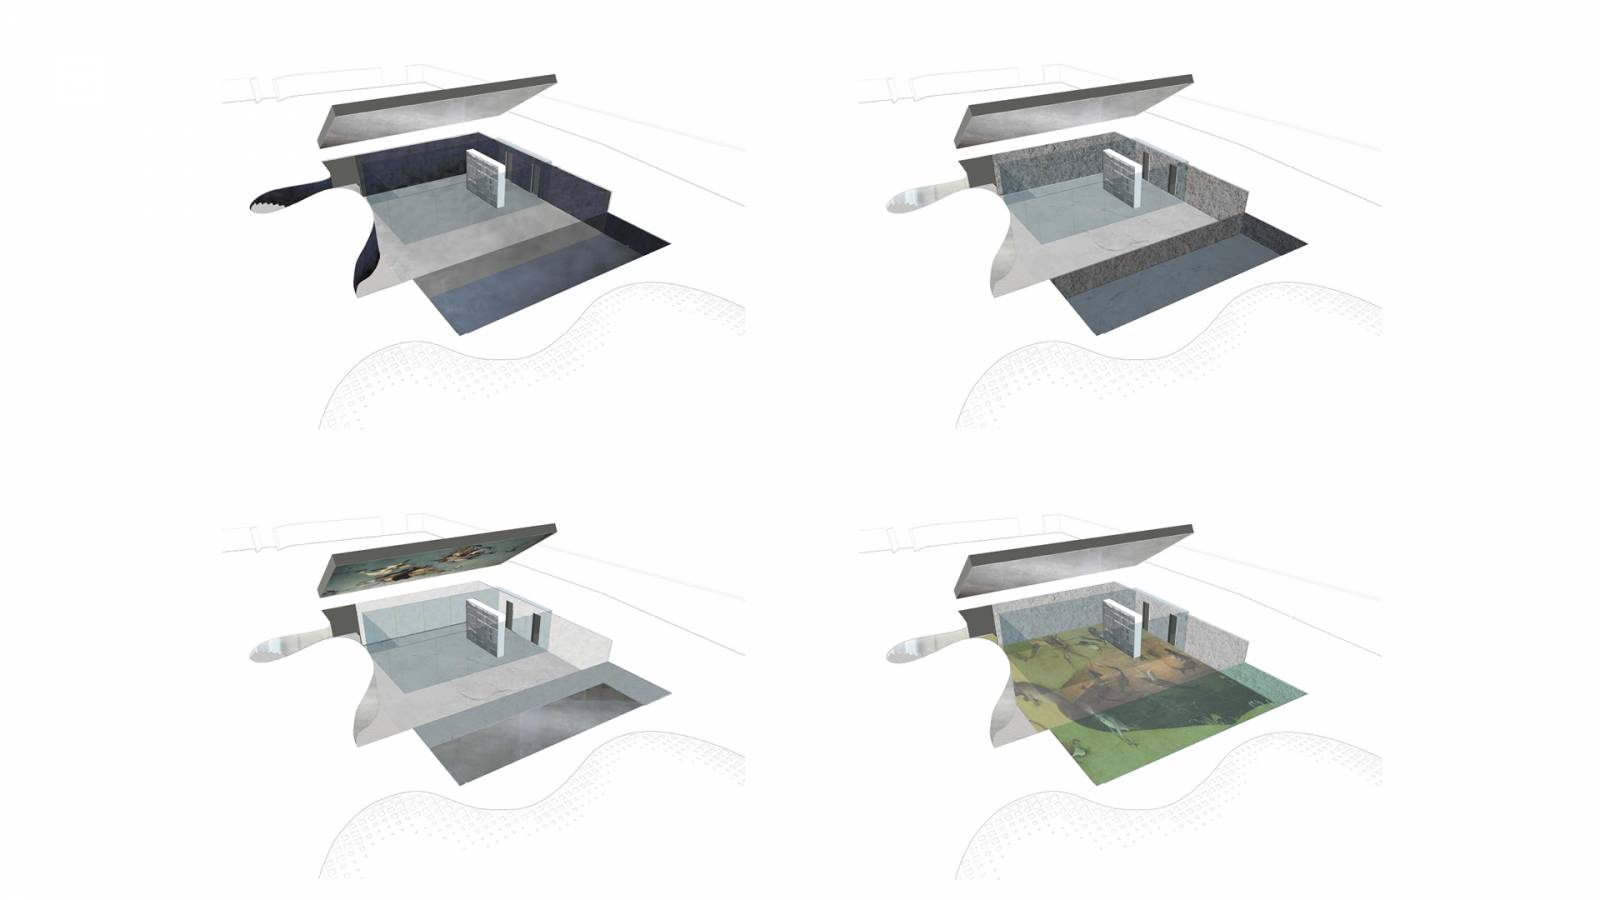 MATERIALITY STUDIES - São Paulo Art Pavillion - SPOL Architects